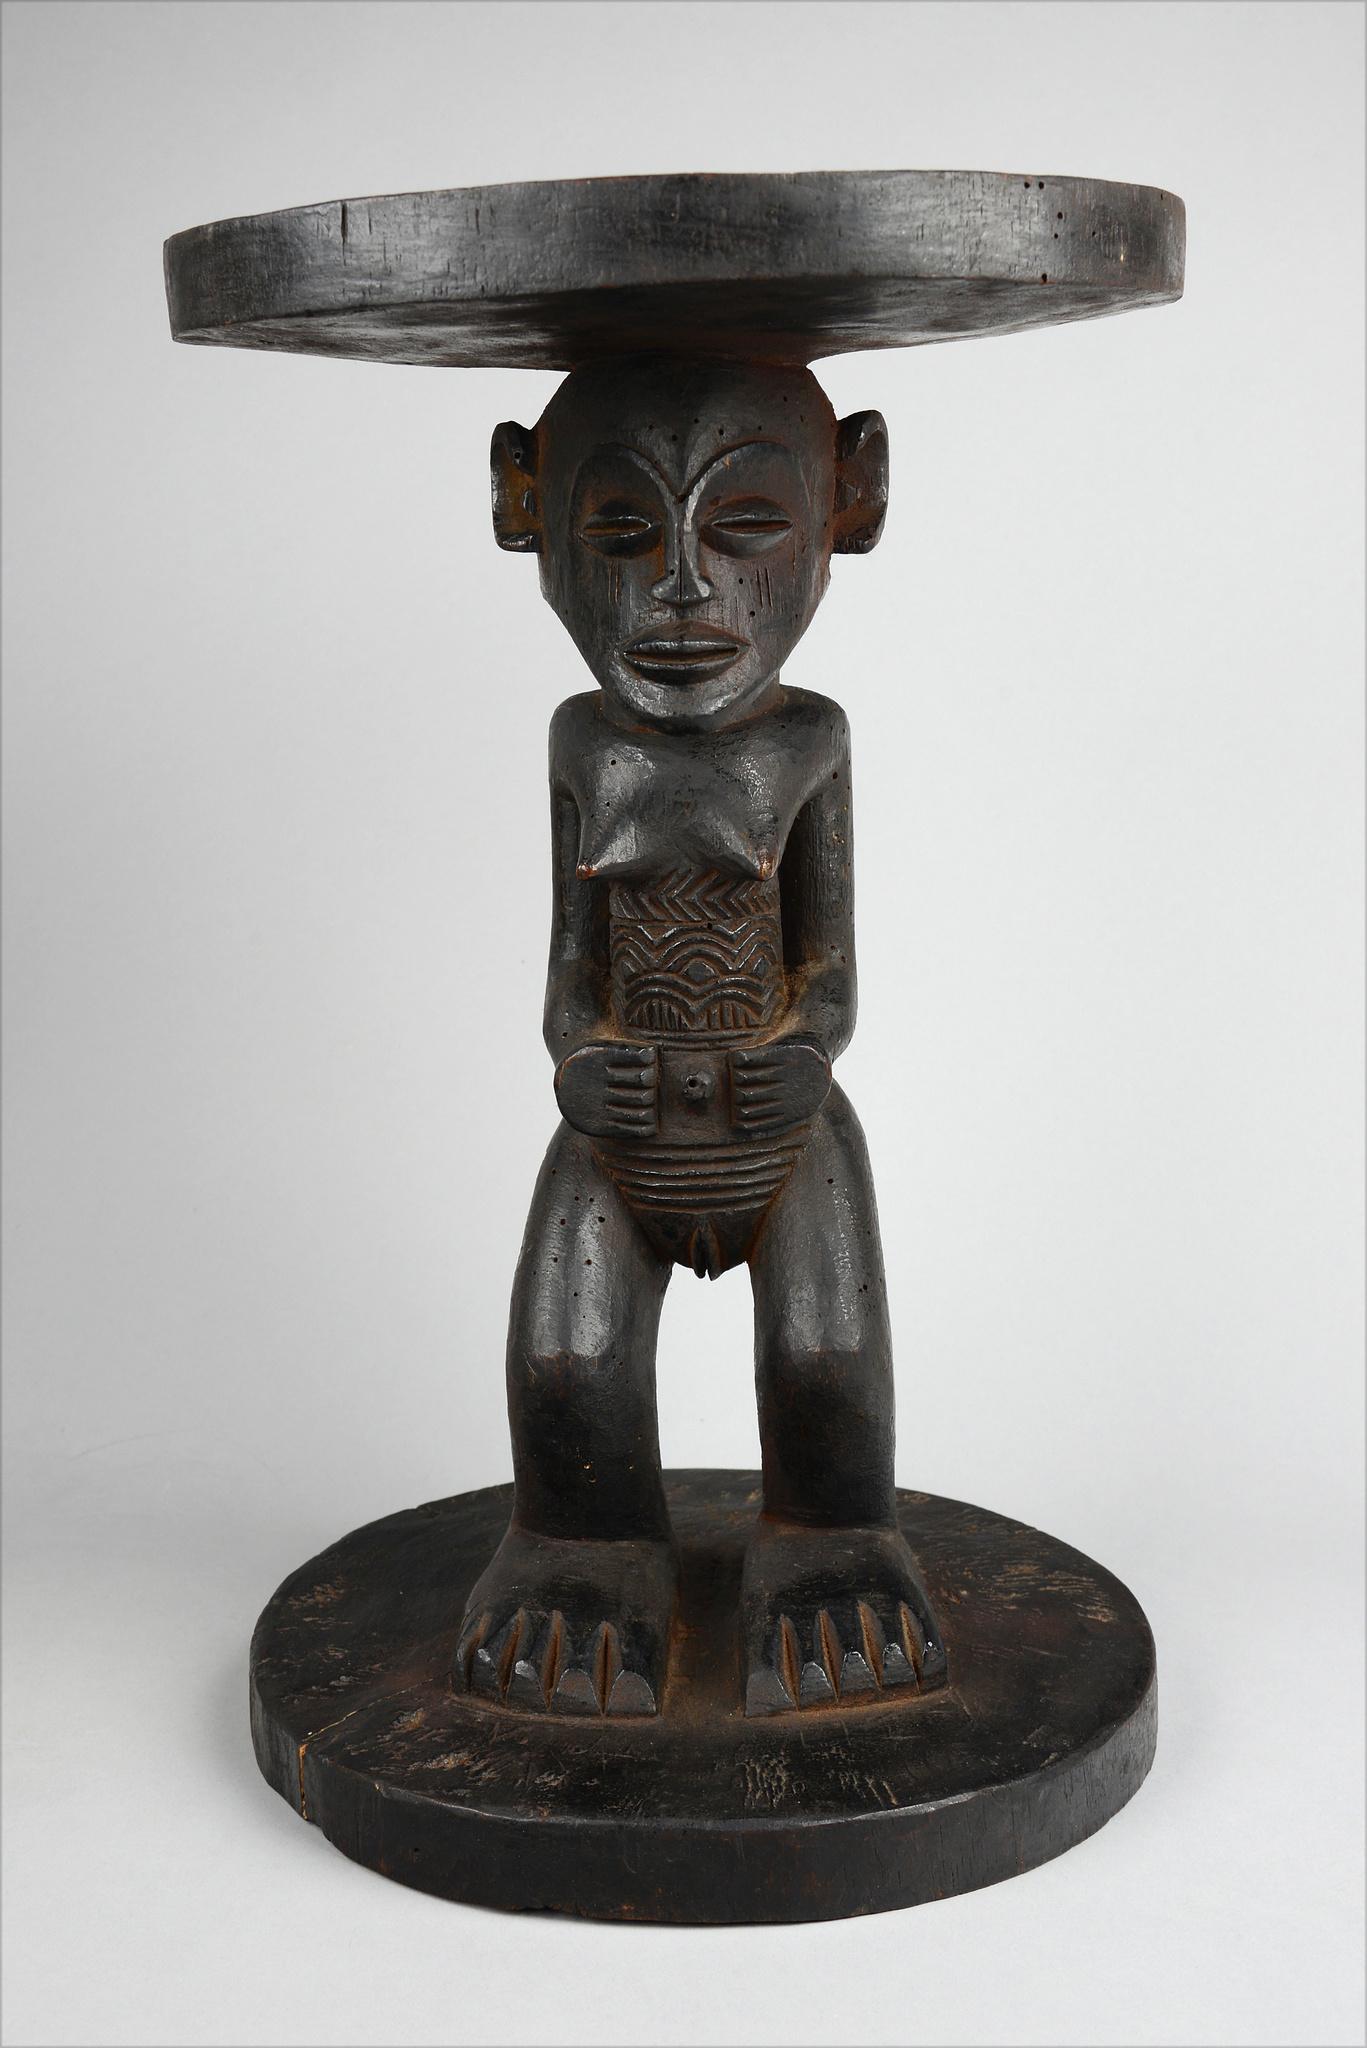 Chief's stool with female caryatid figure